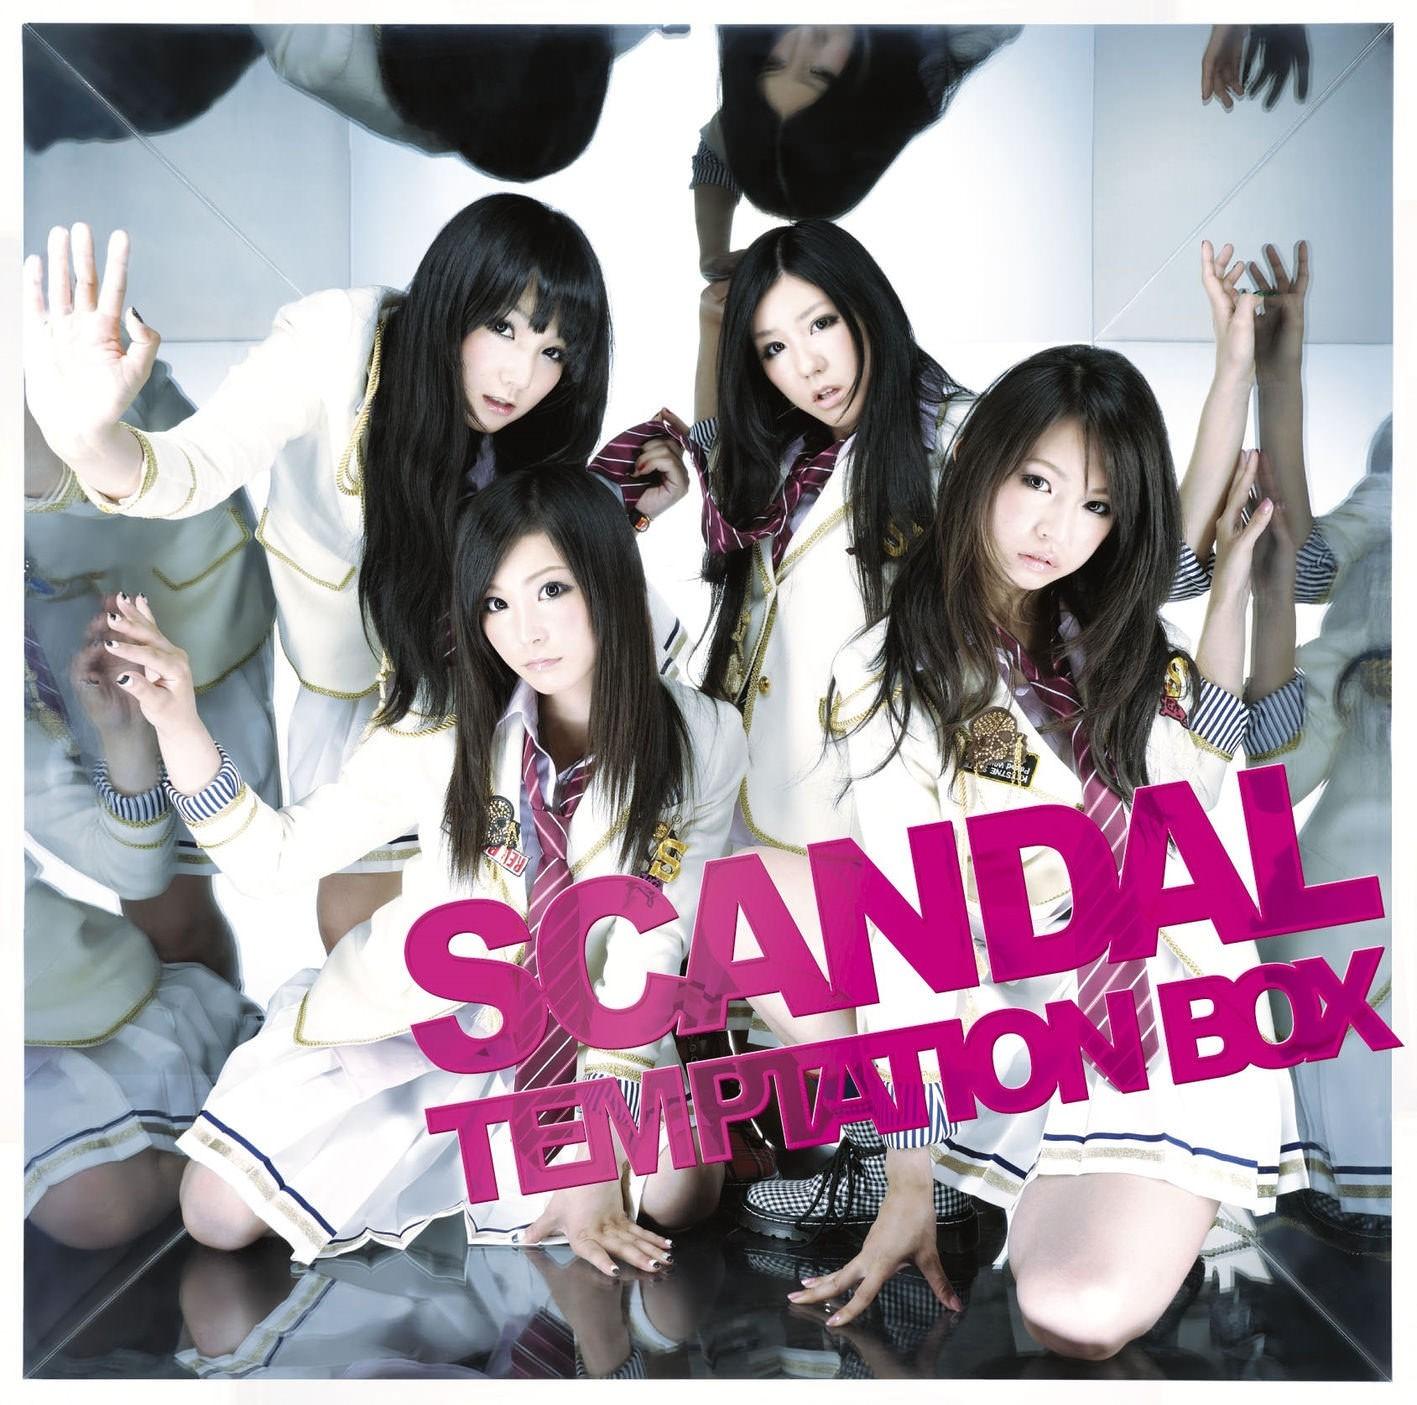 SCANDAL – TEMPTATION BOX [FLAC / 24bit Lossless / WEB] [2010.08.11]